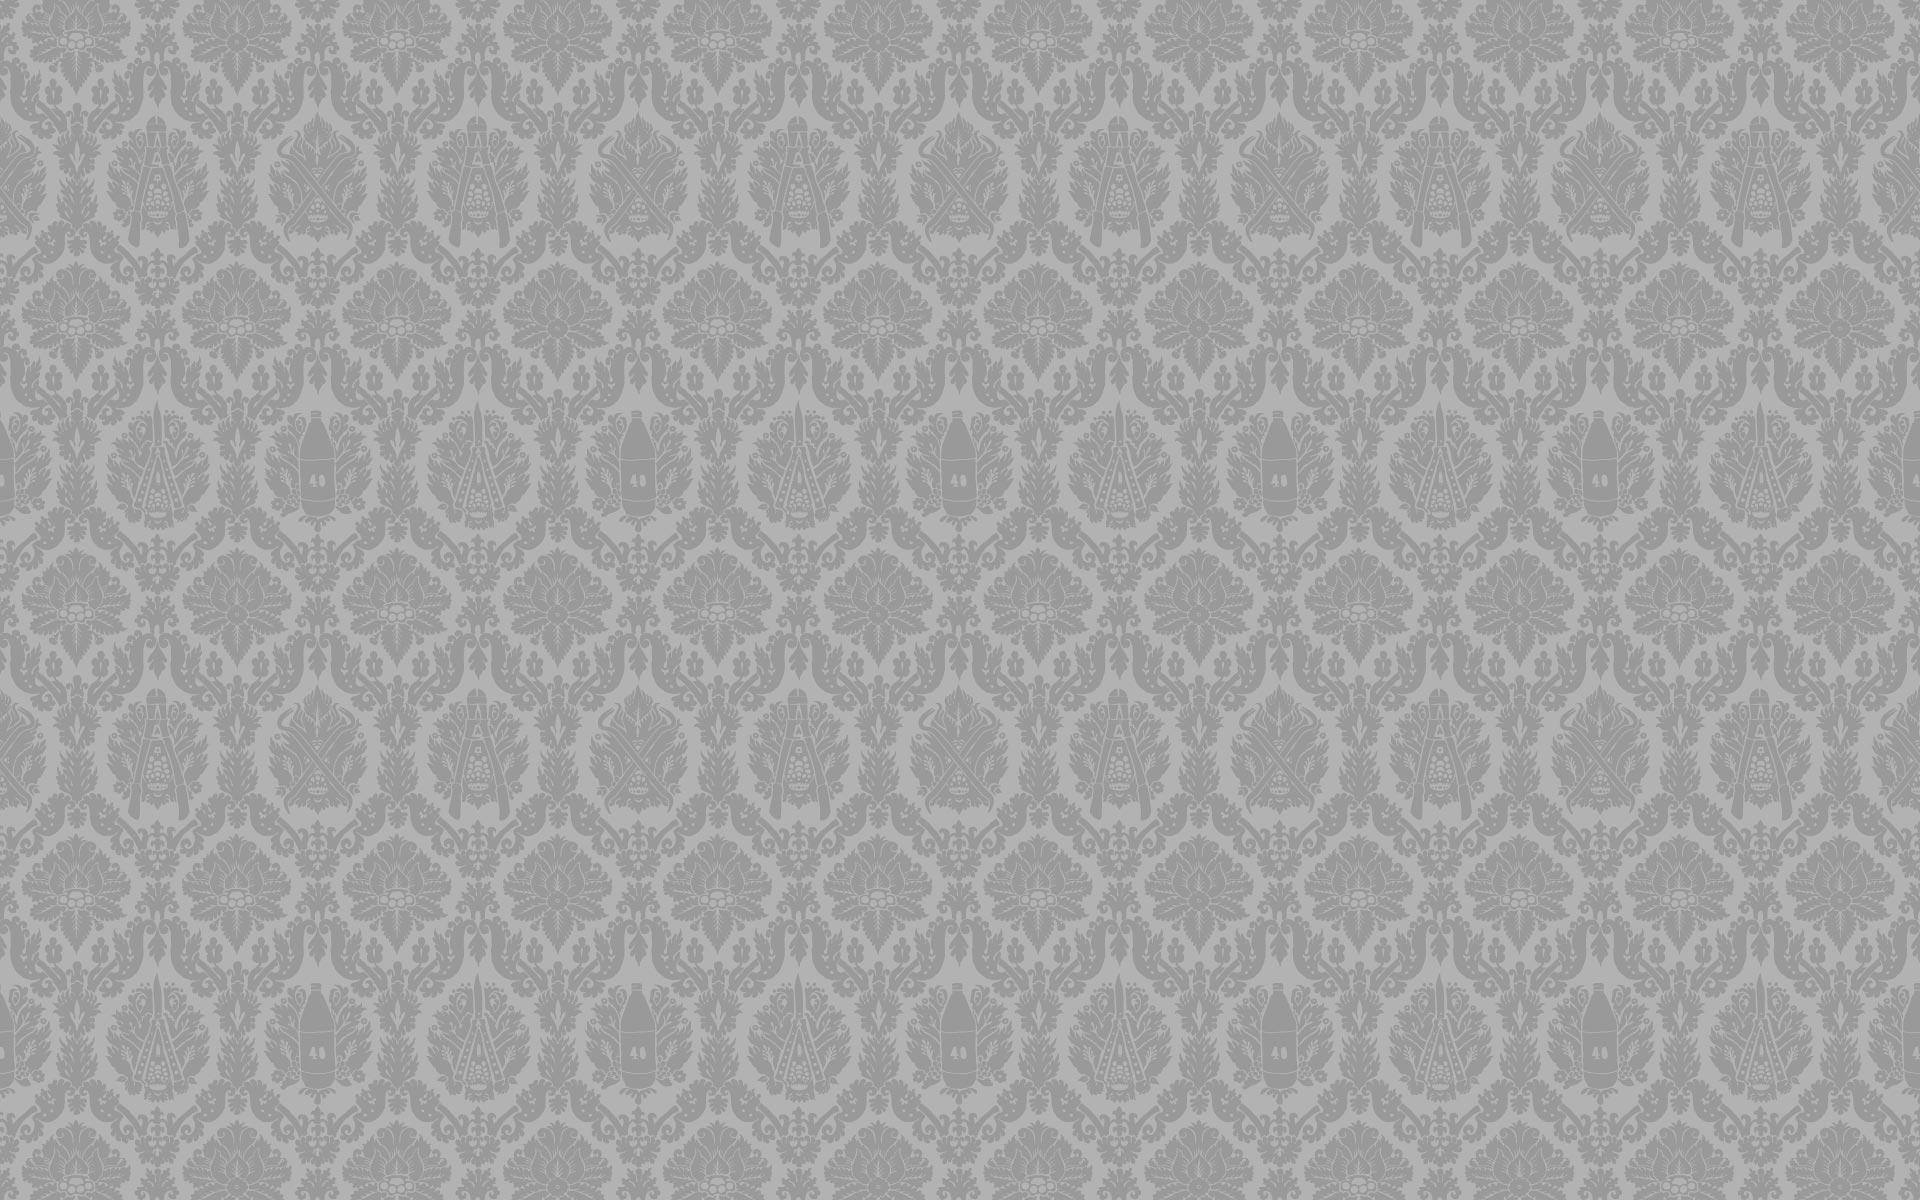 Background Pattern Smileys Grey Web